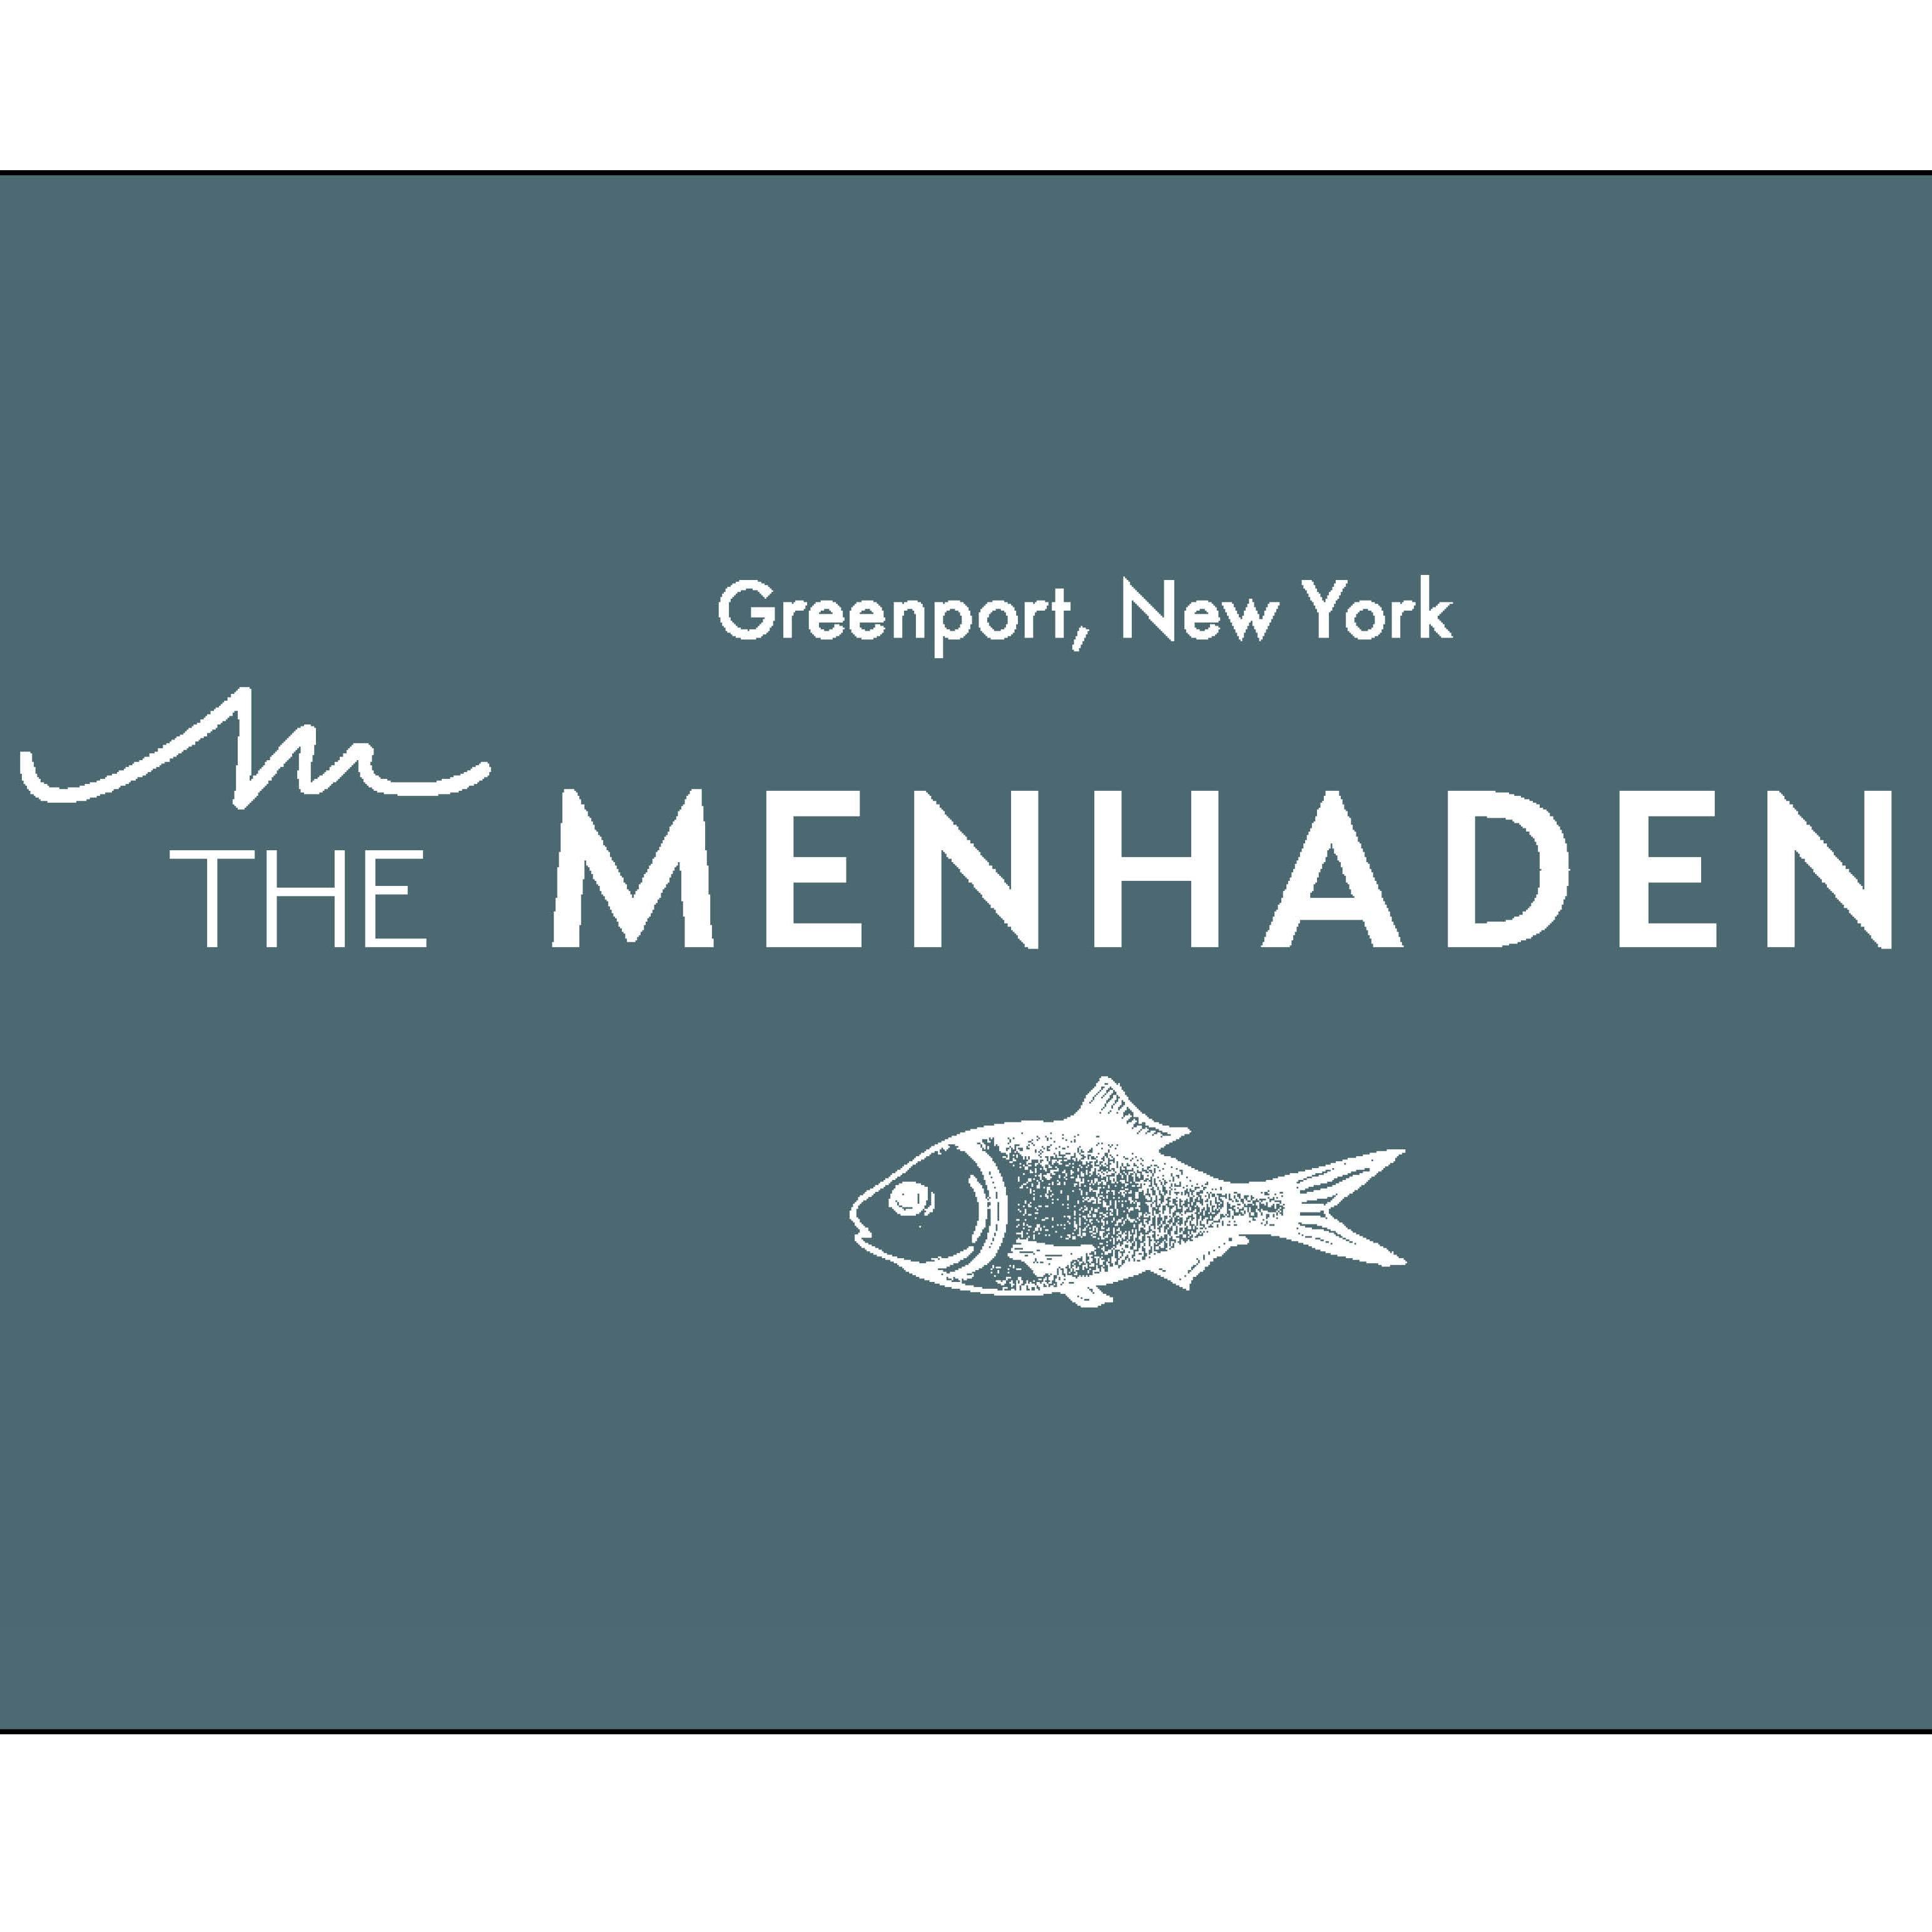 The Menhaden